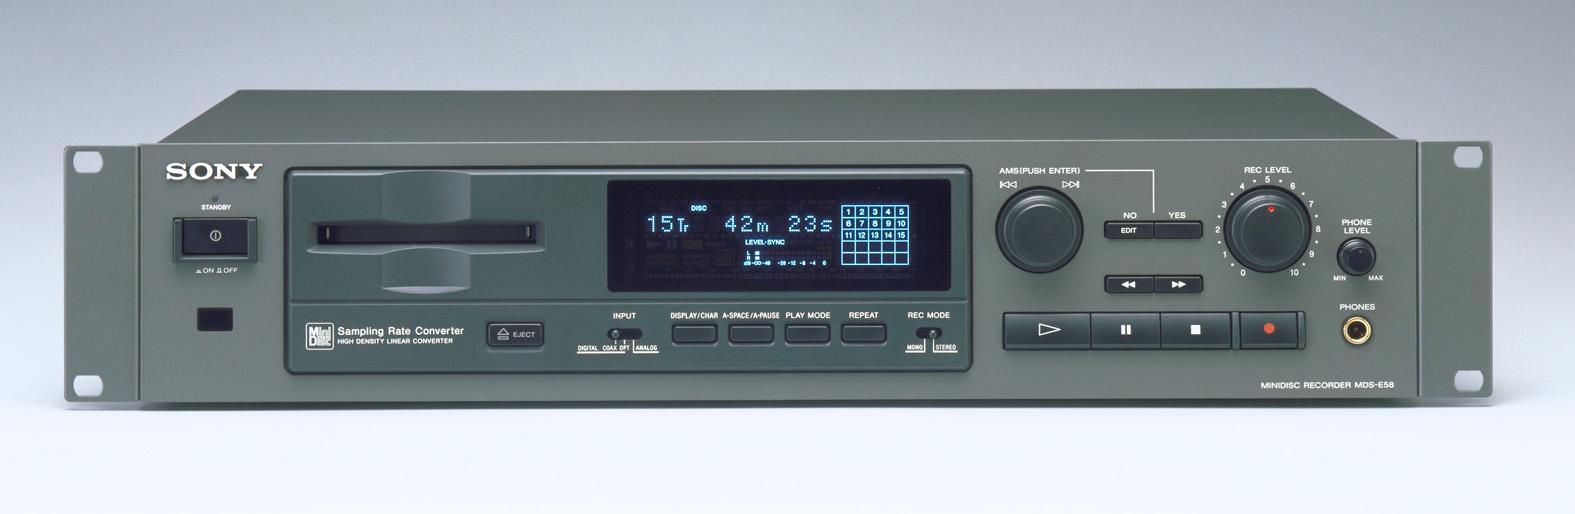 sony system audio rm amu009 manual